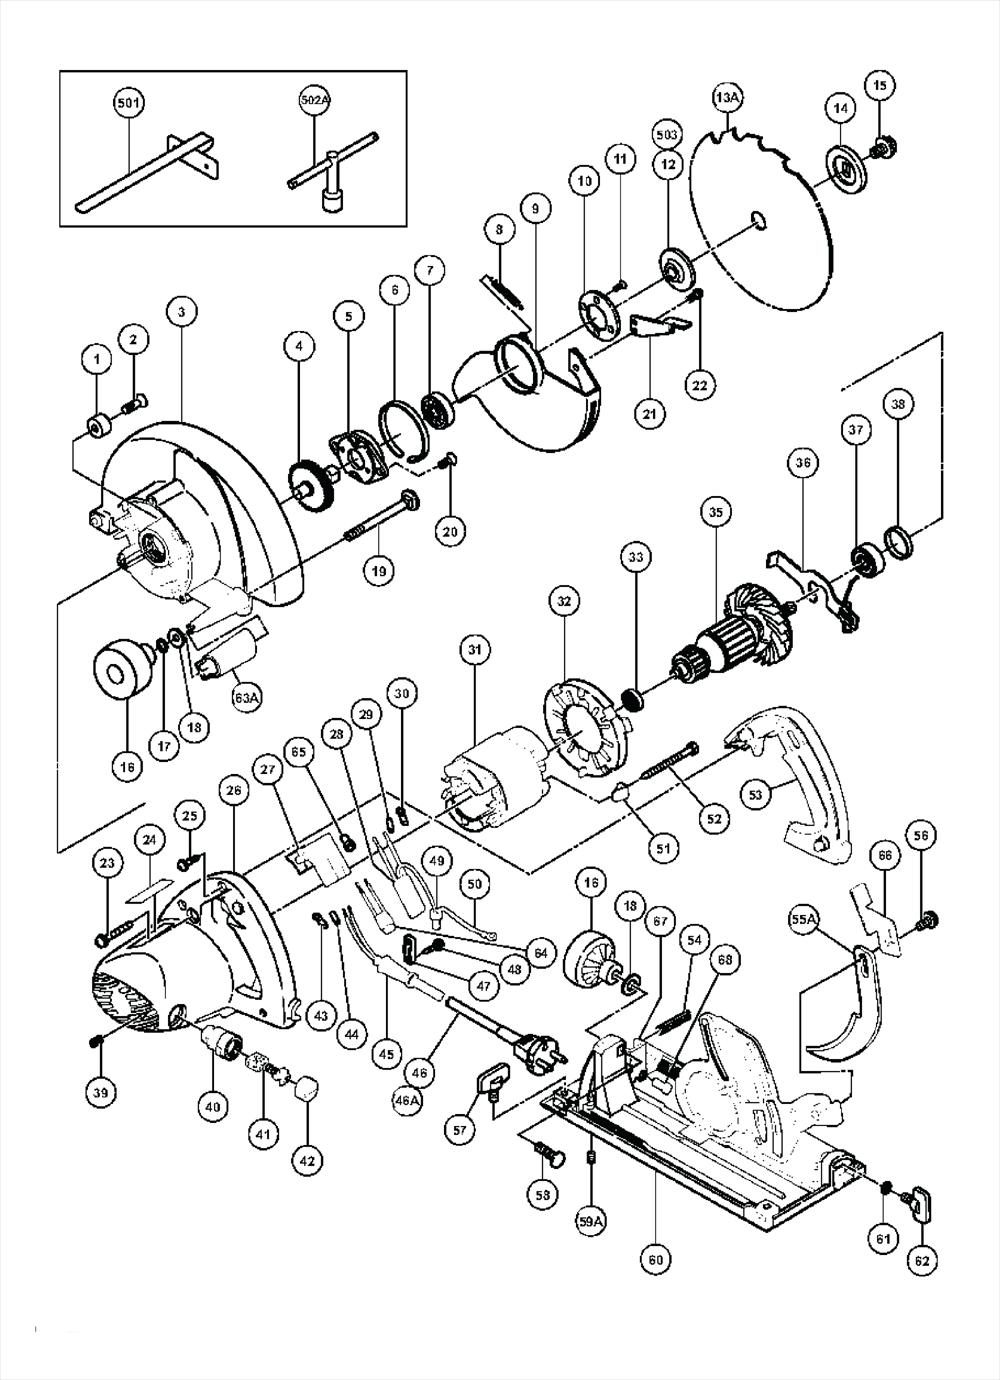 Hitachi c7u parts schematic